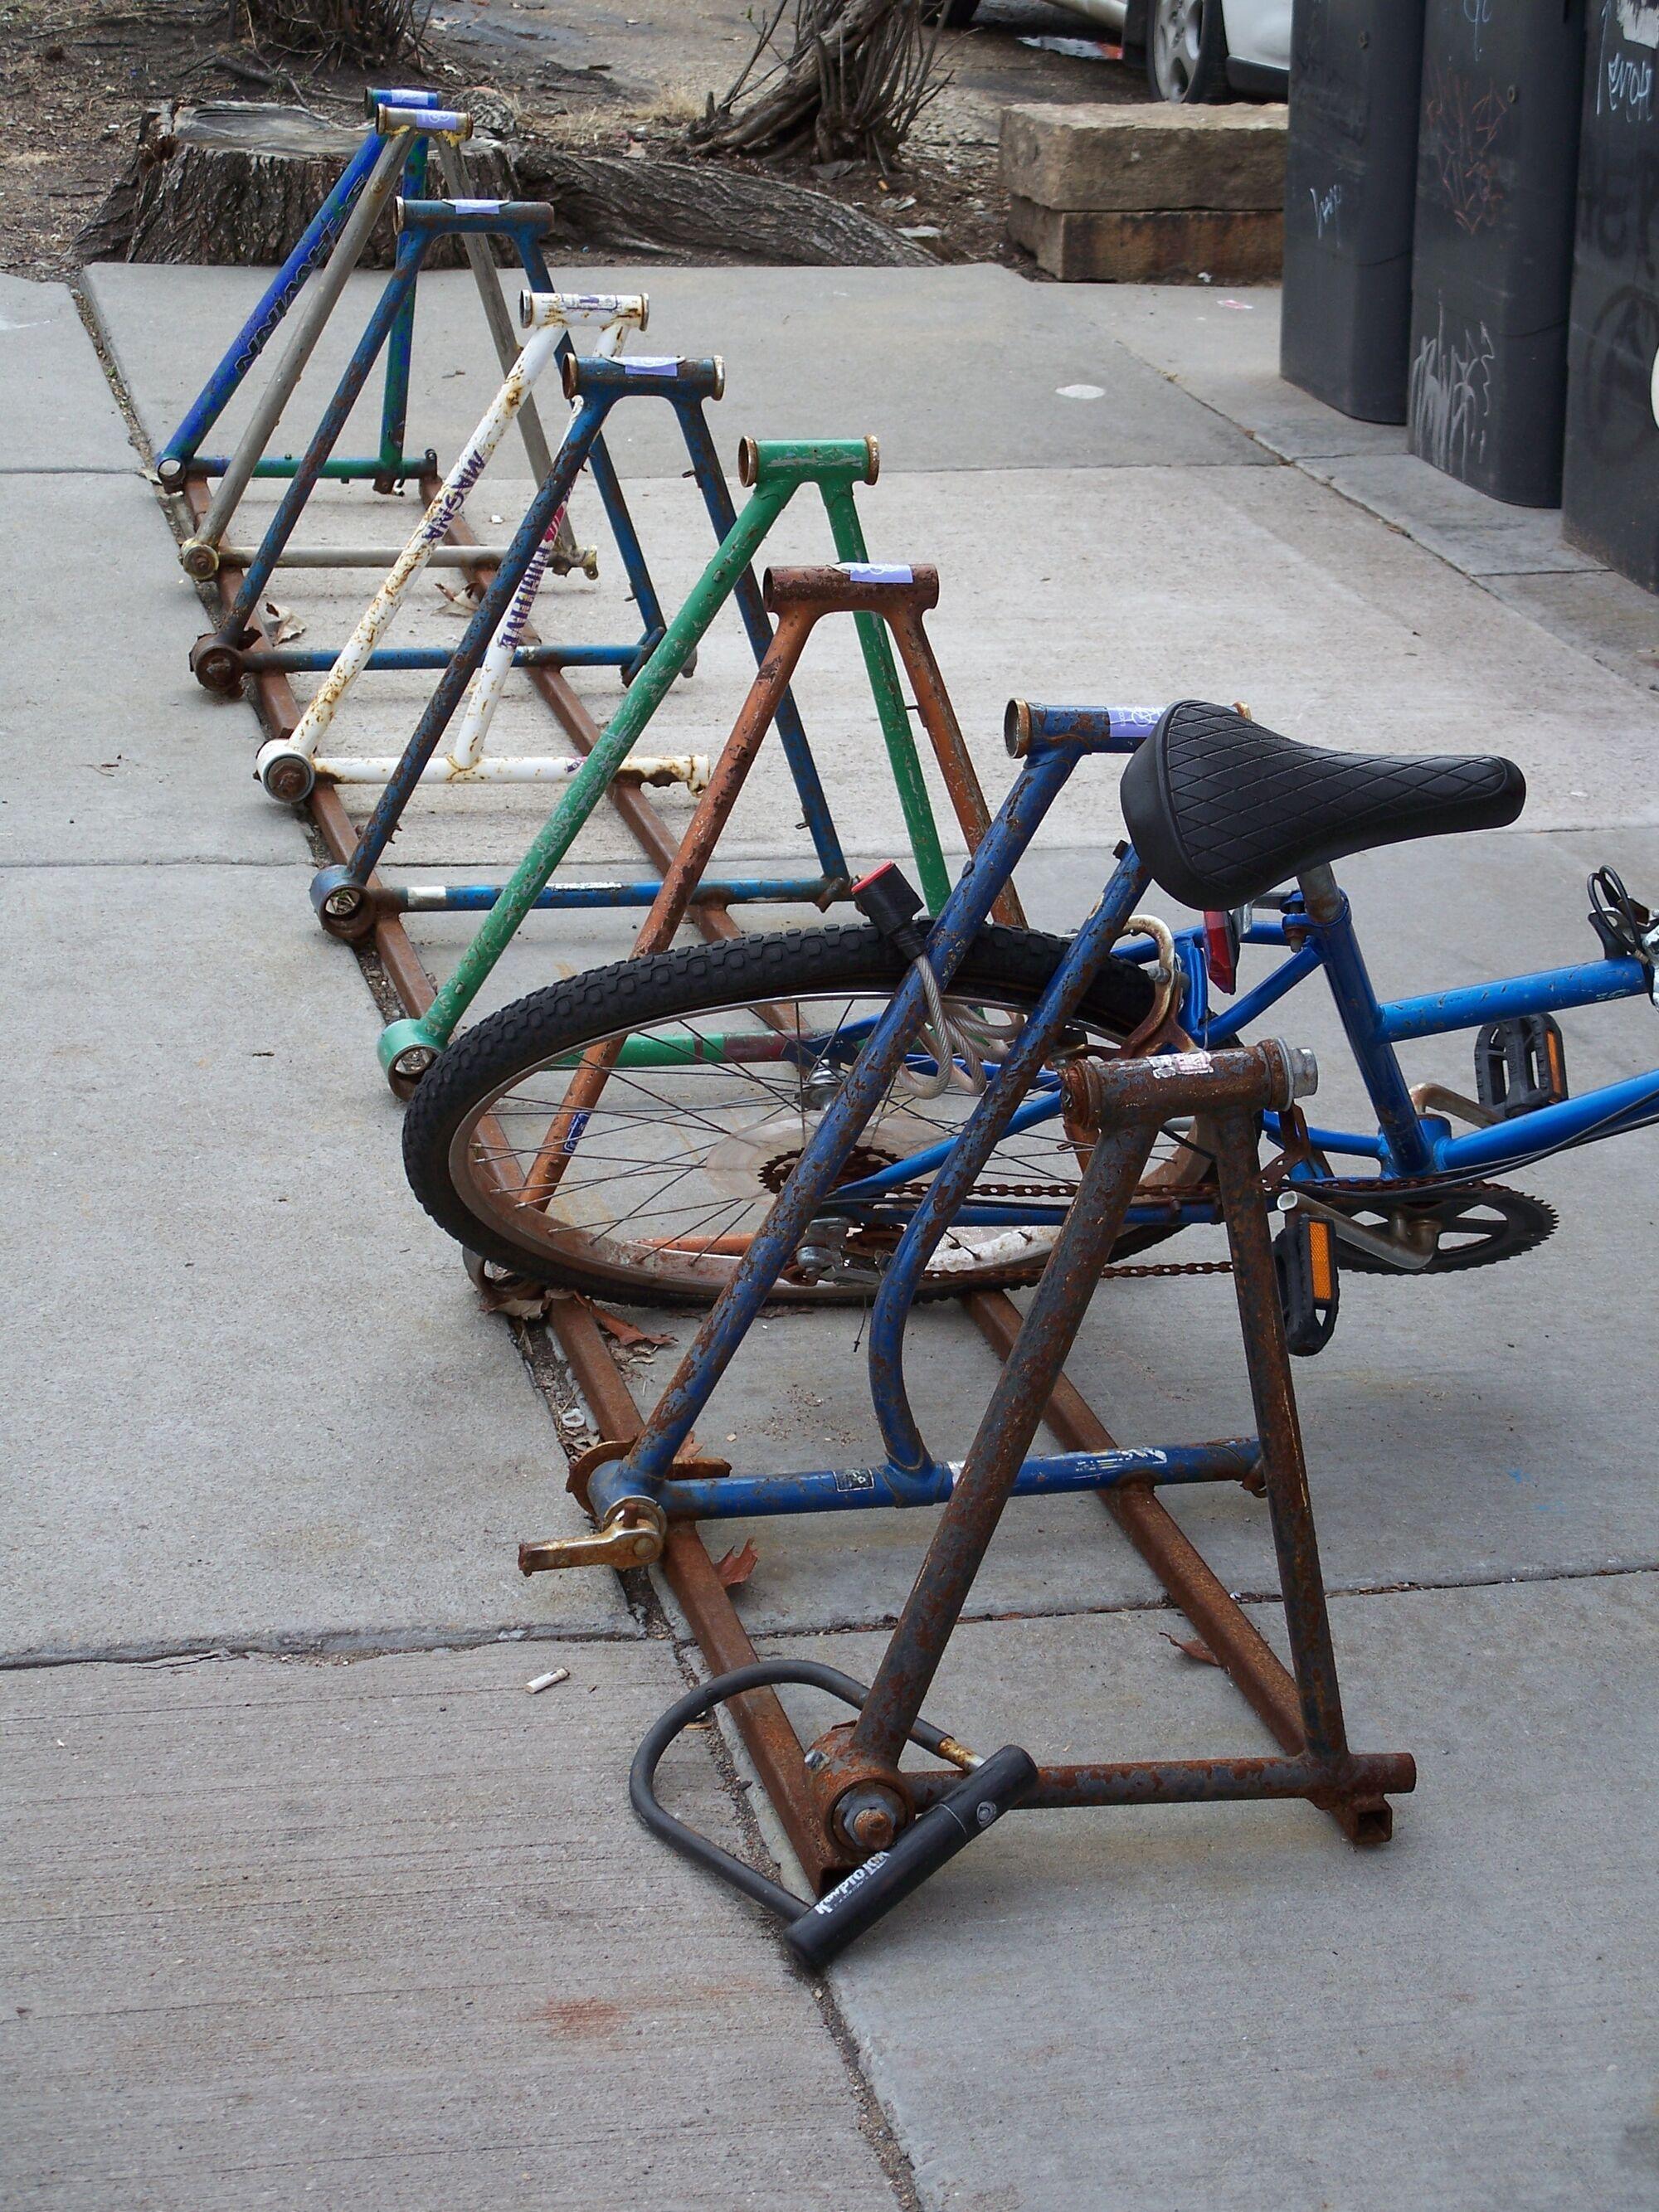 Fahrradrahmen | Fahrrad-Wiki | FANDOM powered by Wikia